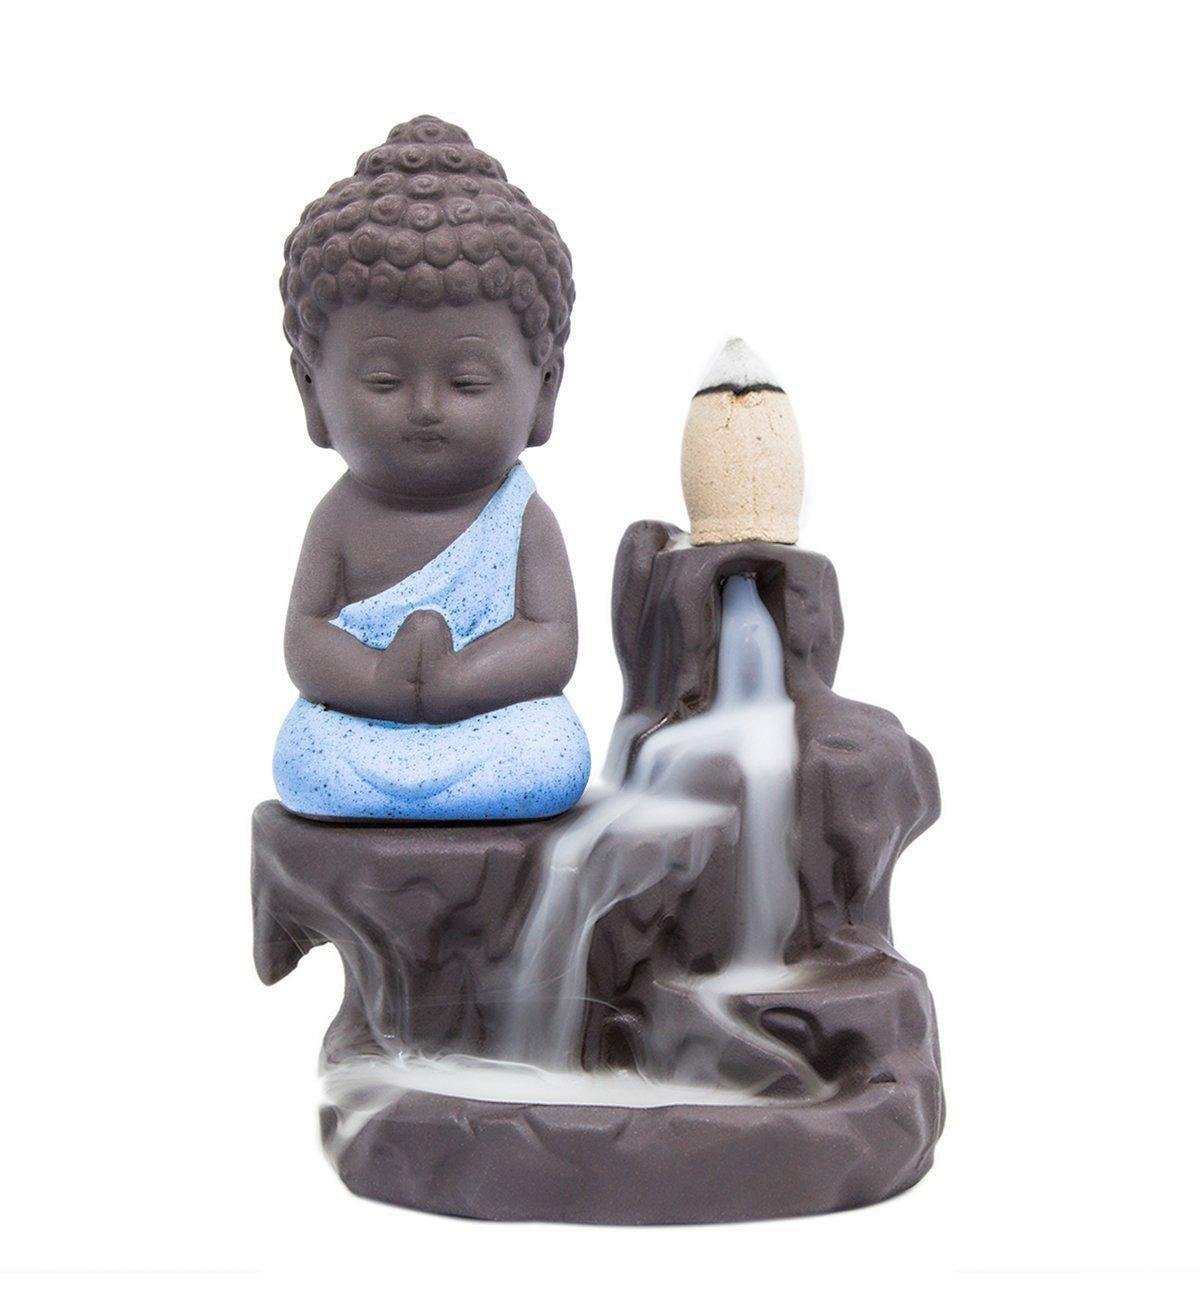 Simon Incense Burner Hand Made Backflow Tower Cones Sticks Little Monk Holder Ceramic Porcelain Buddha (Blue)